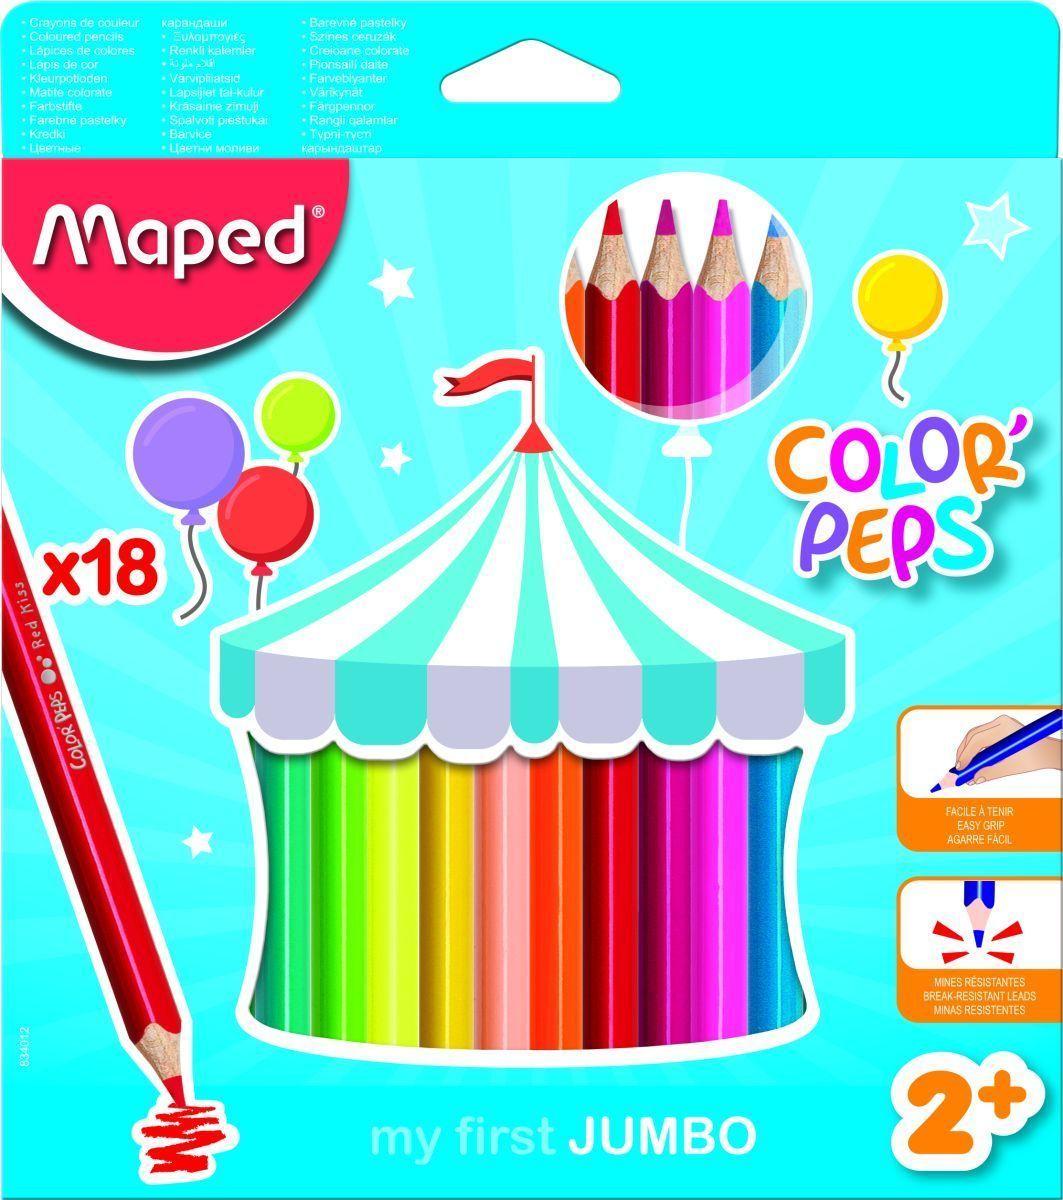 Maped Набор цветных карандашей Color Pep's Jumbo 18 цветов карандаши восковые мелки пастель maped карандаши color peps 18 цветов